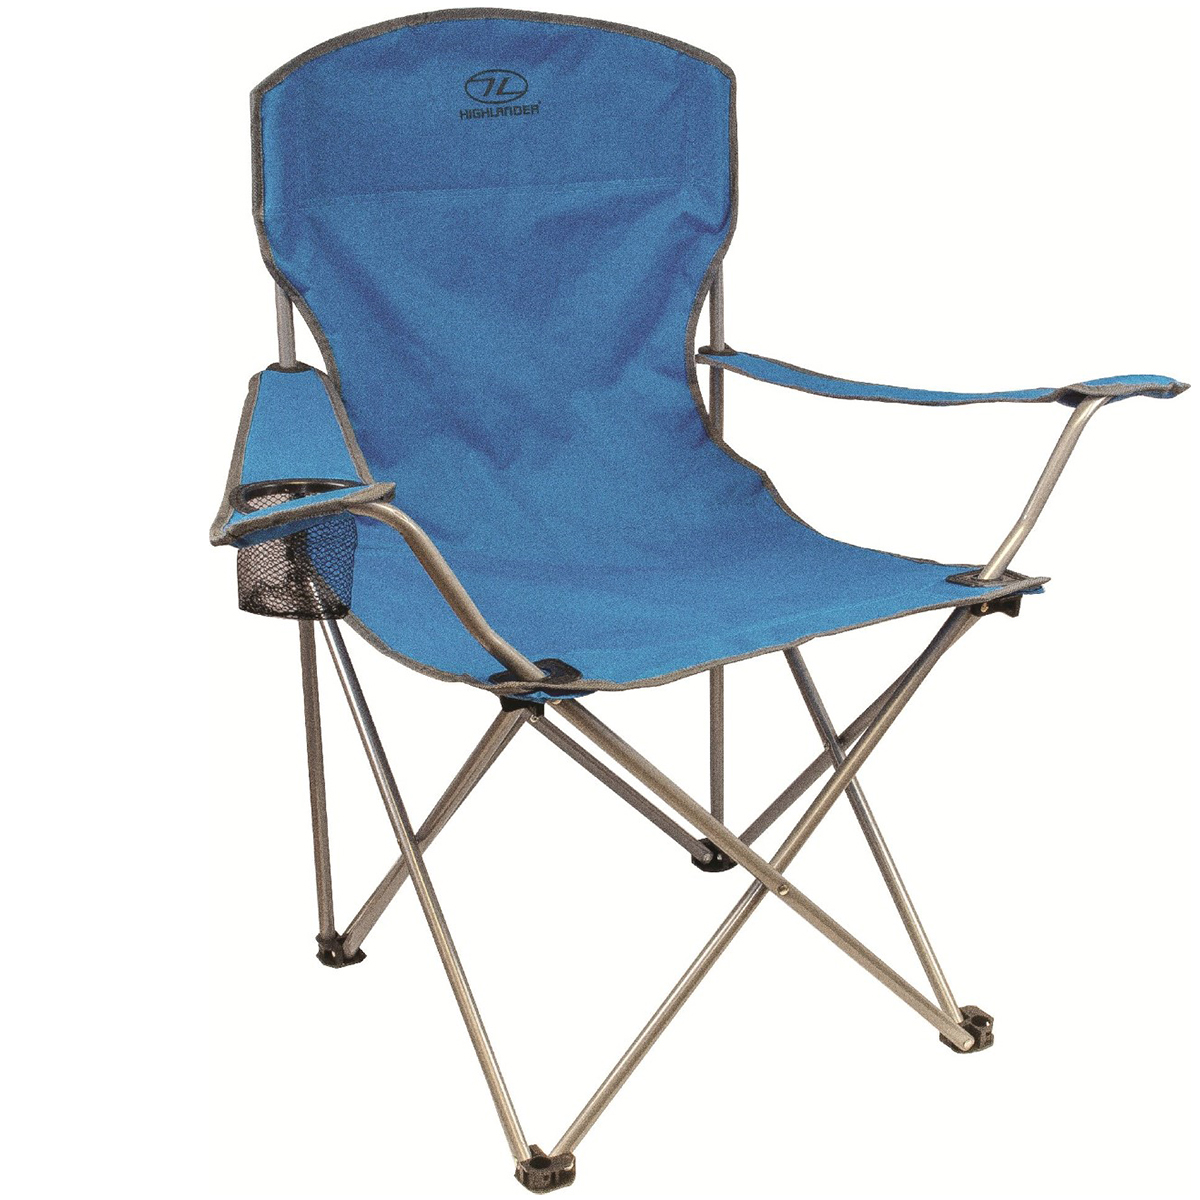 Highlander Folding Camp Chair Festival Picnic Sitting